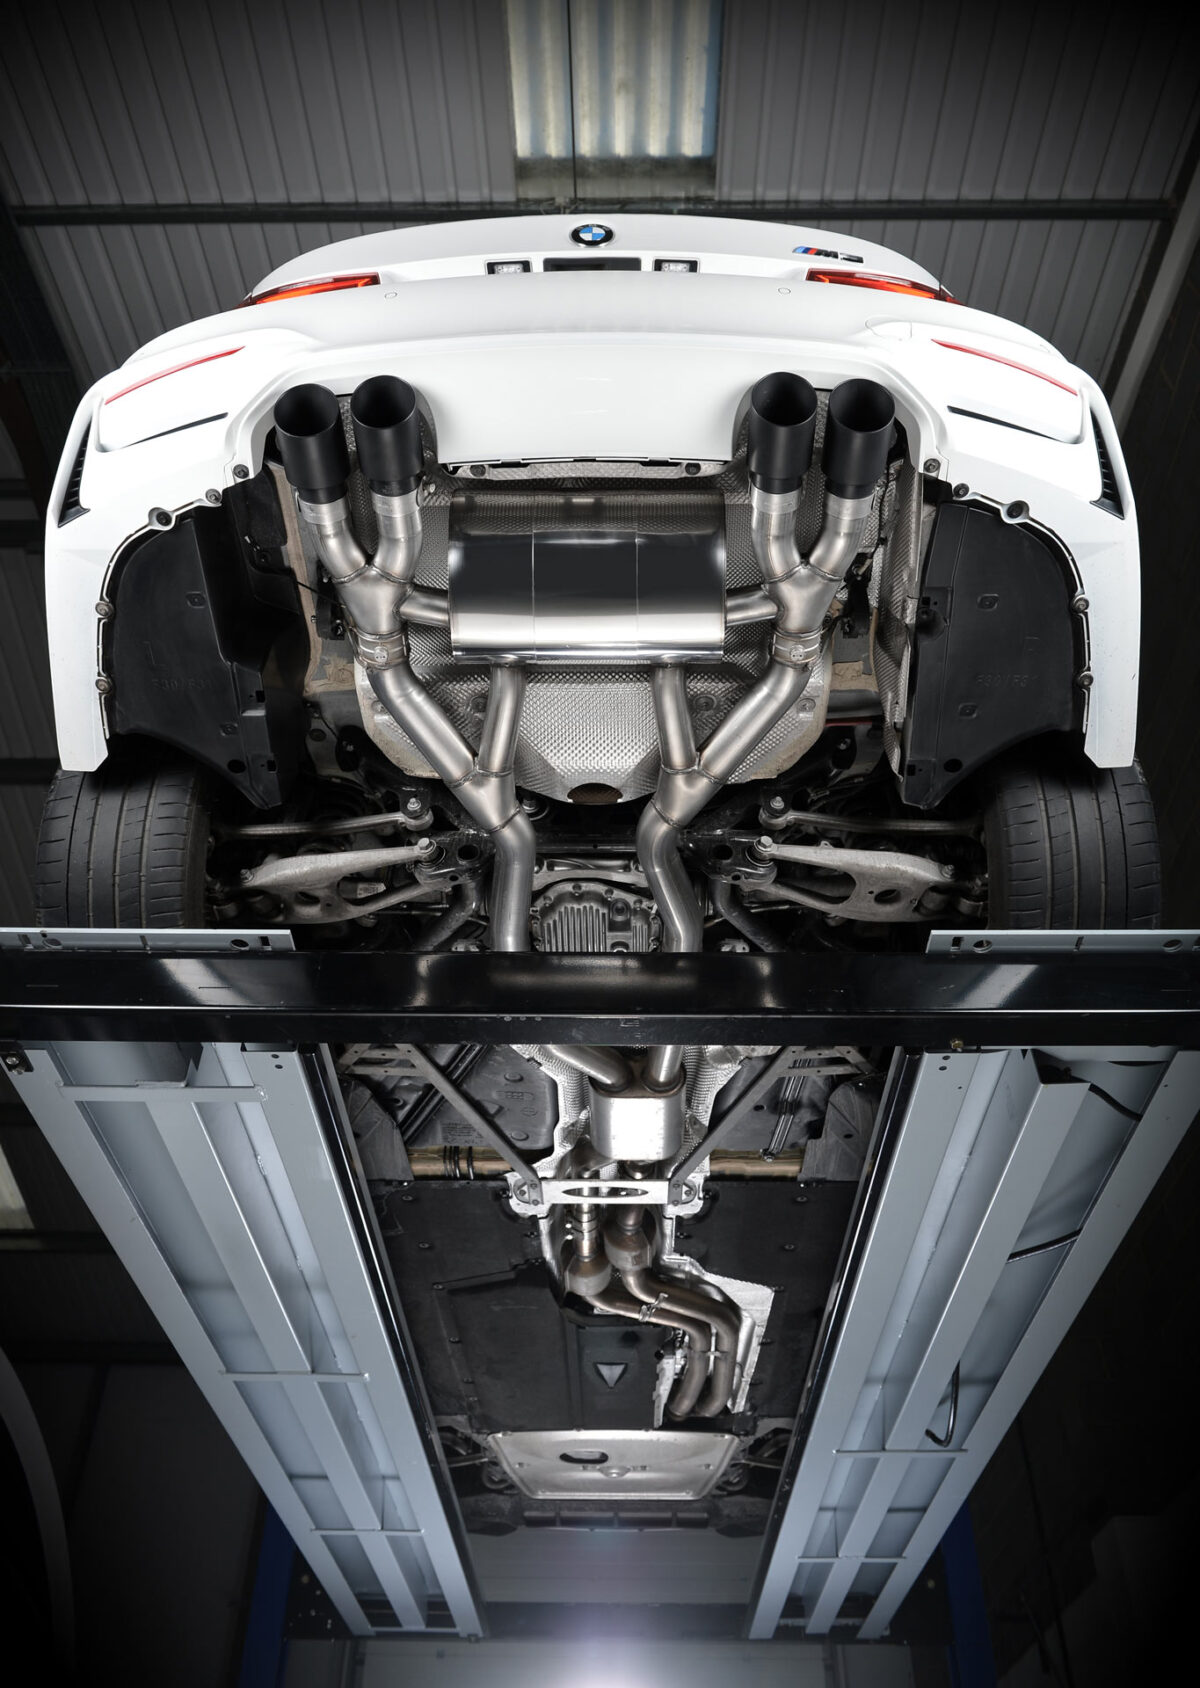 MILLTEK Cat Back Exhaust System SSXBM993 BMW F80 M3 Saloon / BMW F82 M4 Coupé